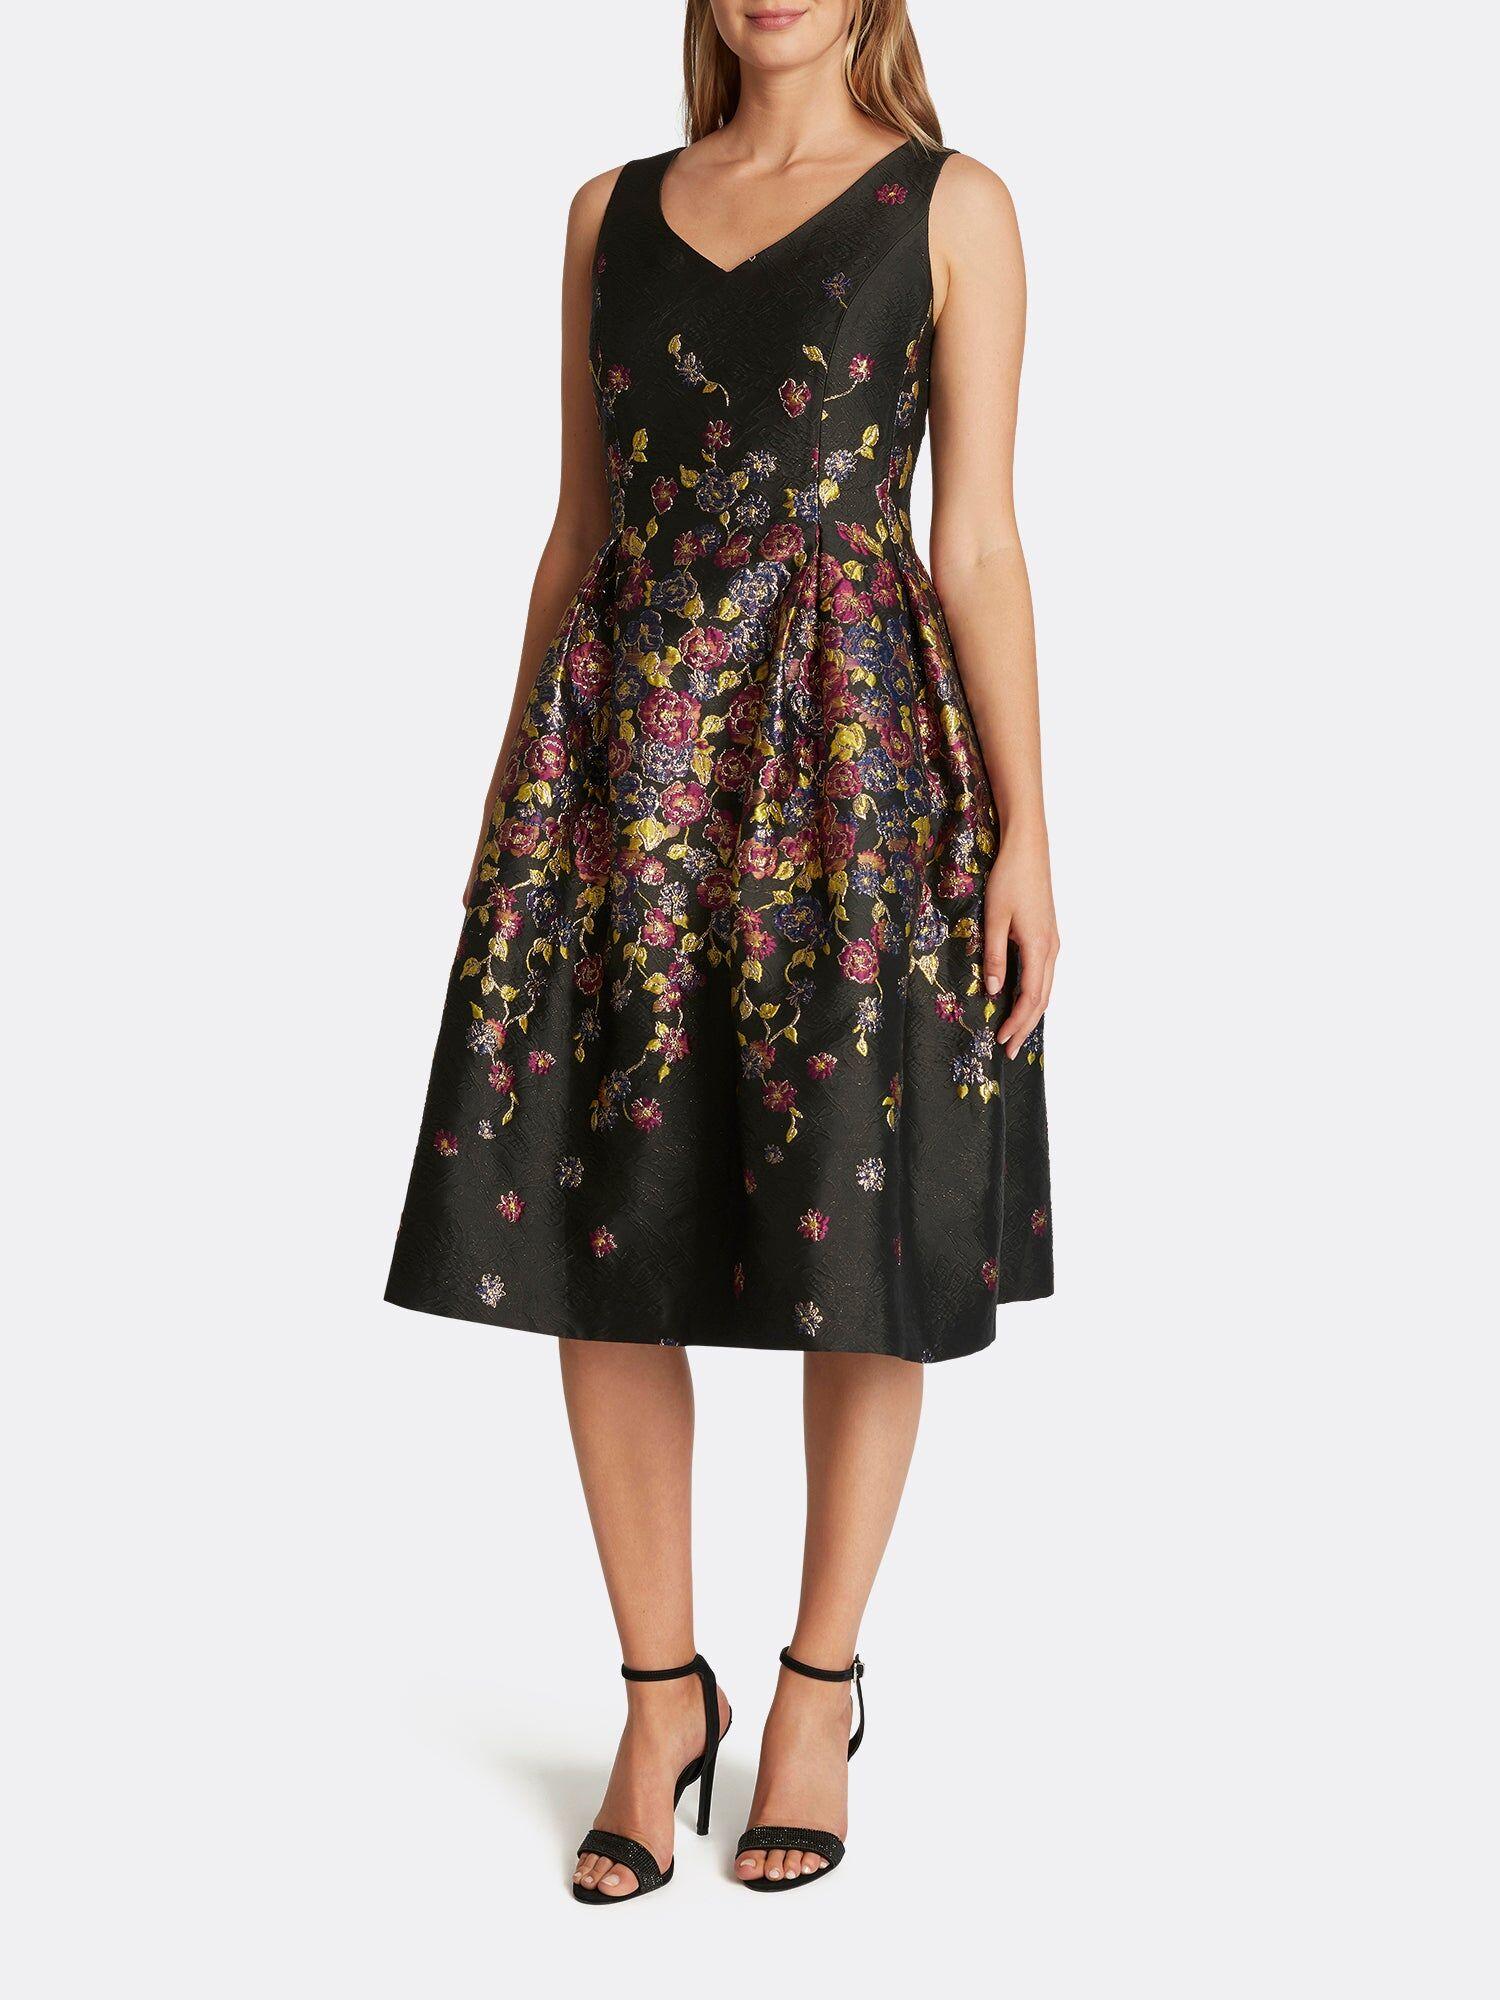 Tahari ASL Lurex Floral Jacquard Midi Dress Black Aster Garden Size: 14